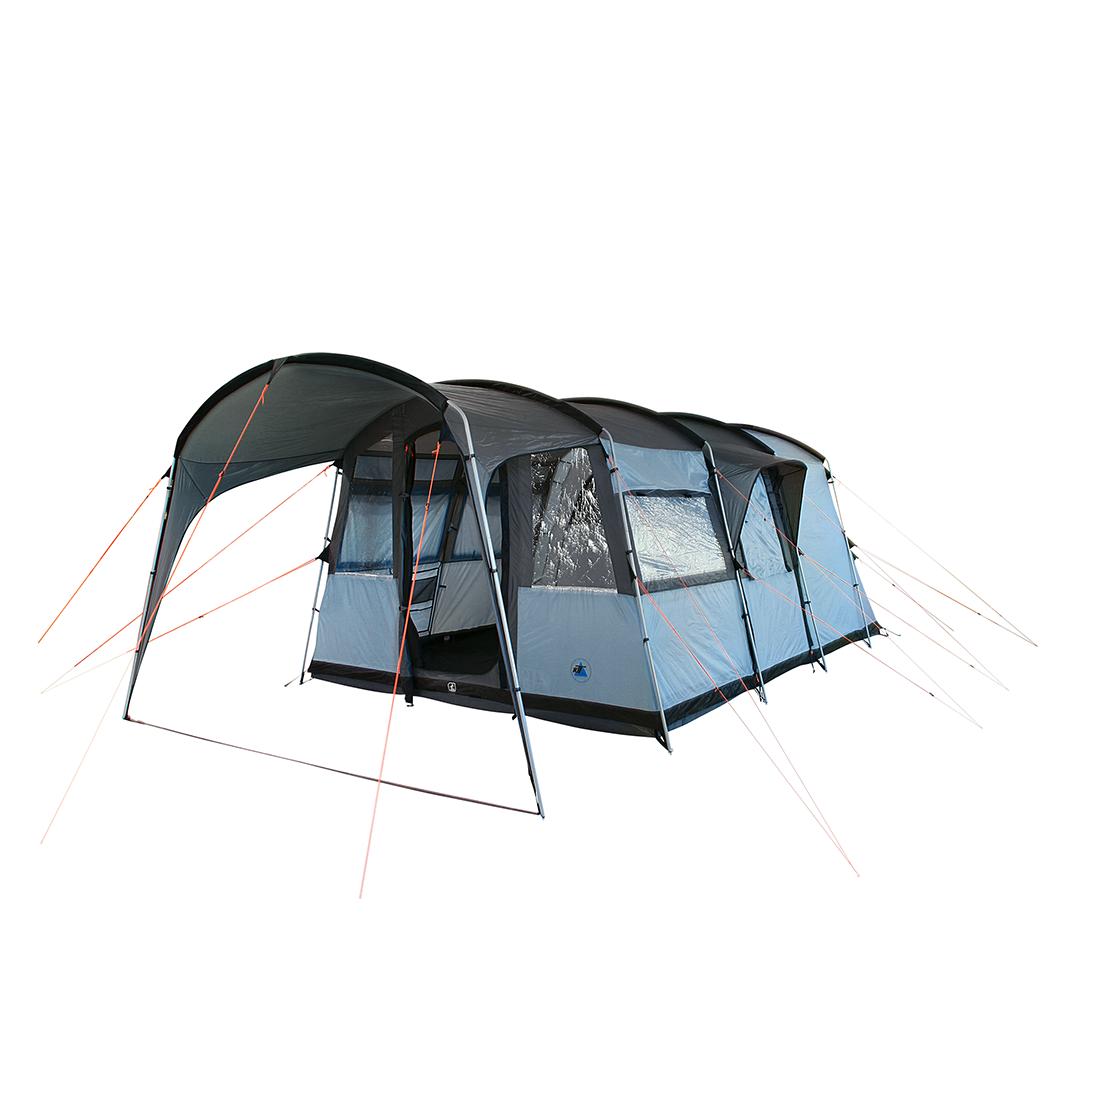 Bateman 4 Personen Zelt Tunnelzelt Familienzelt Camping… | 04260181765495